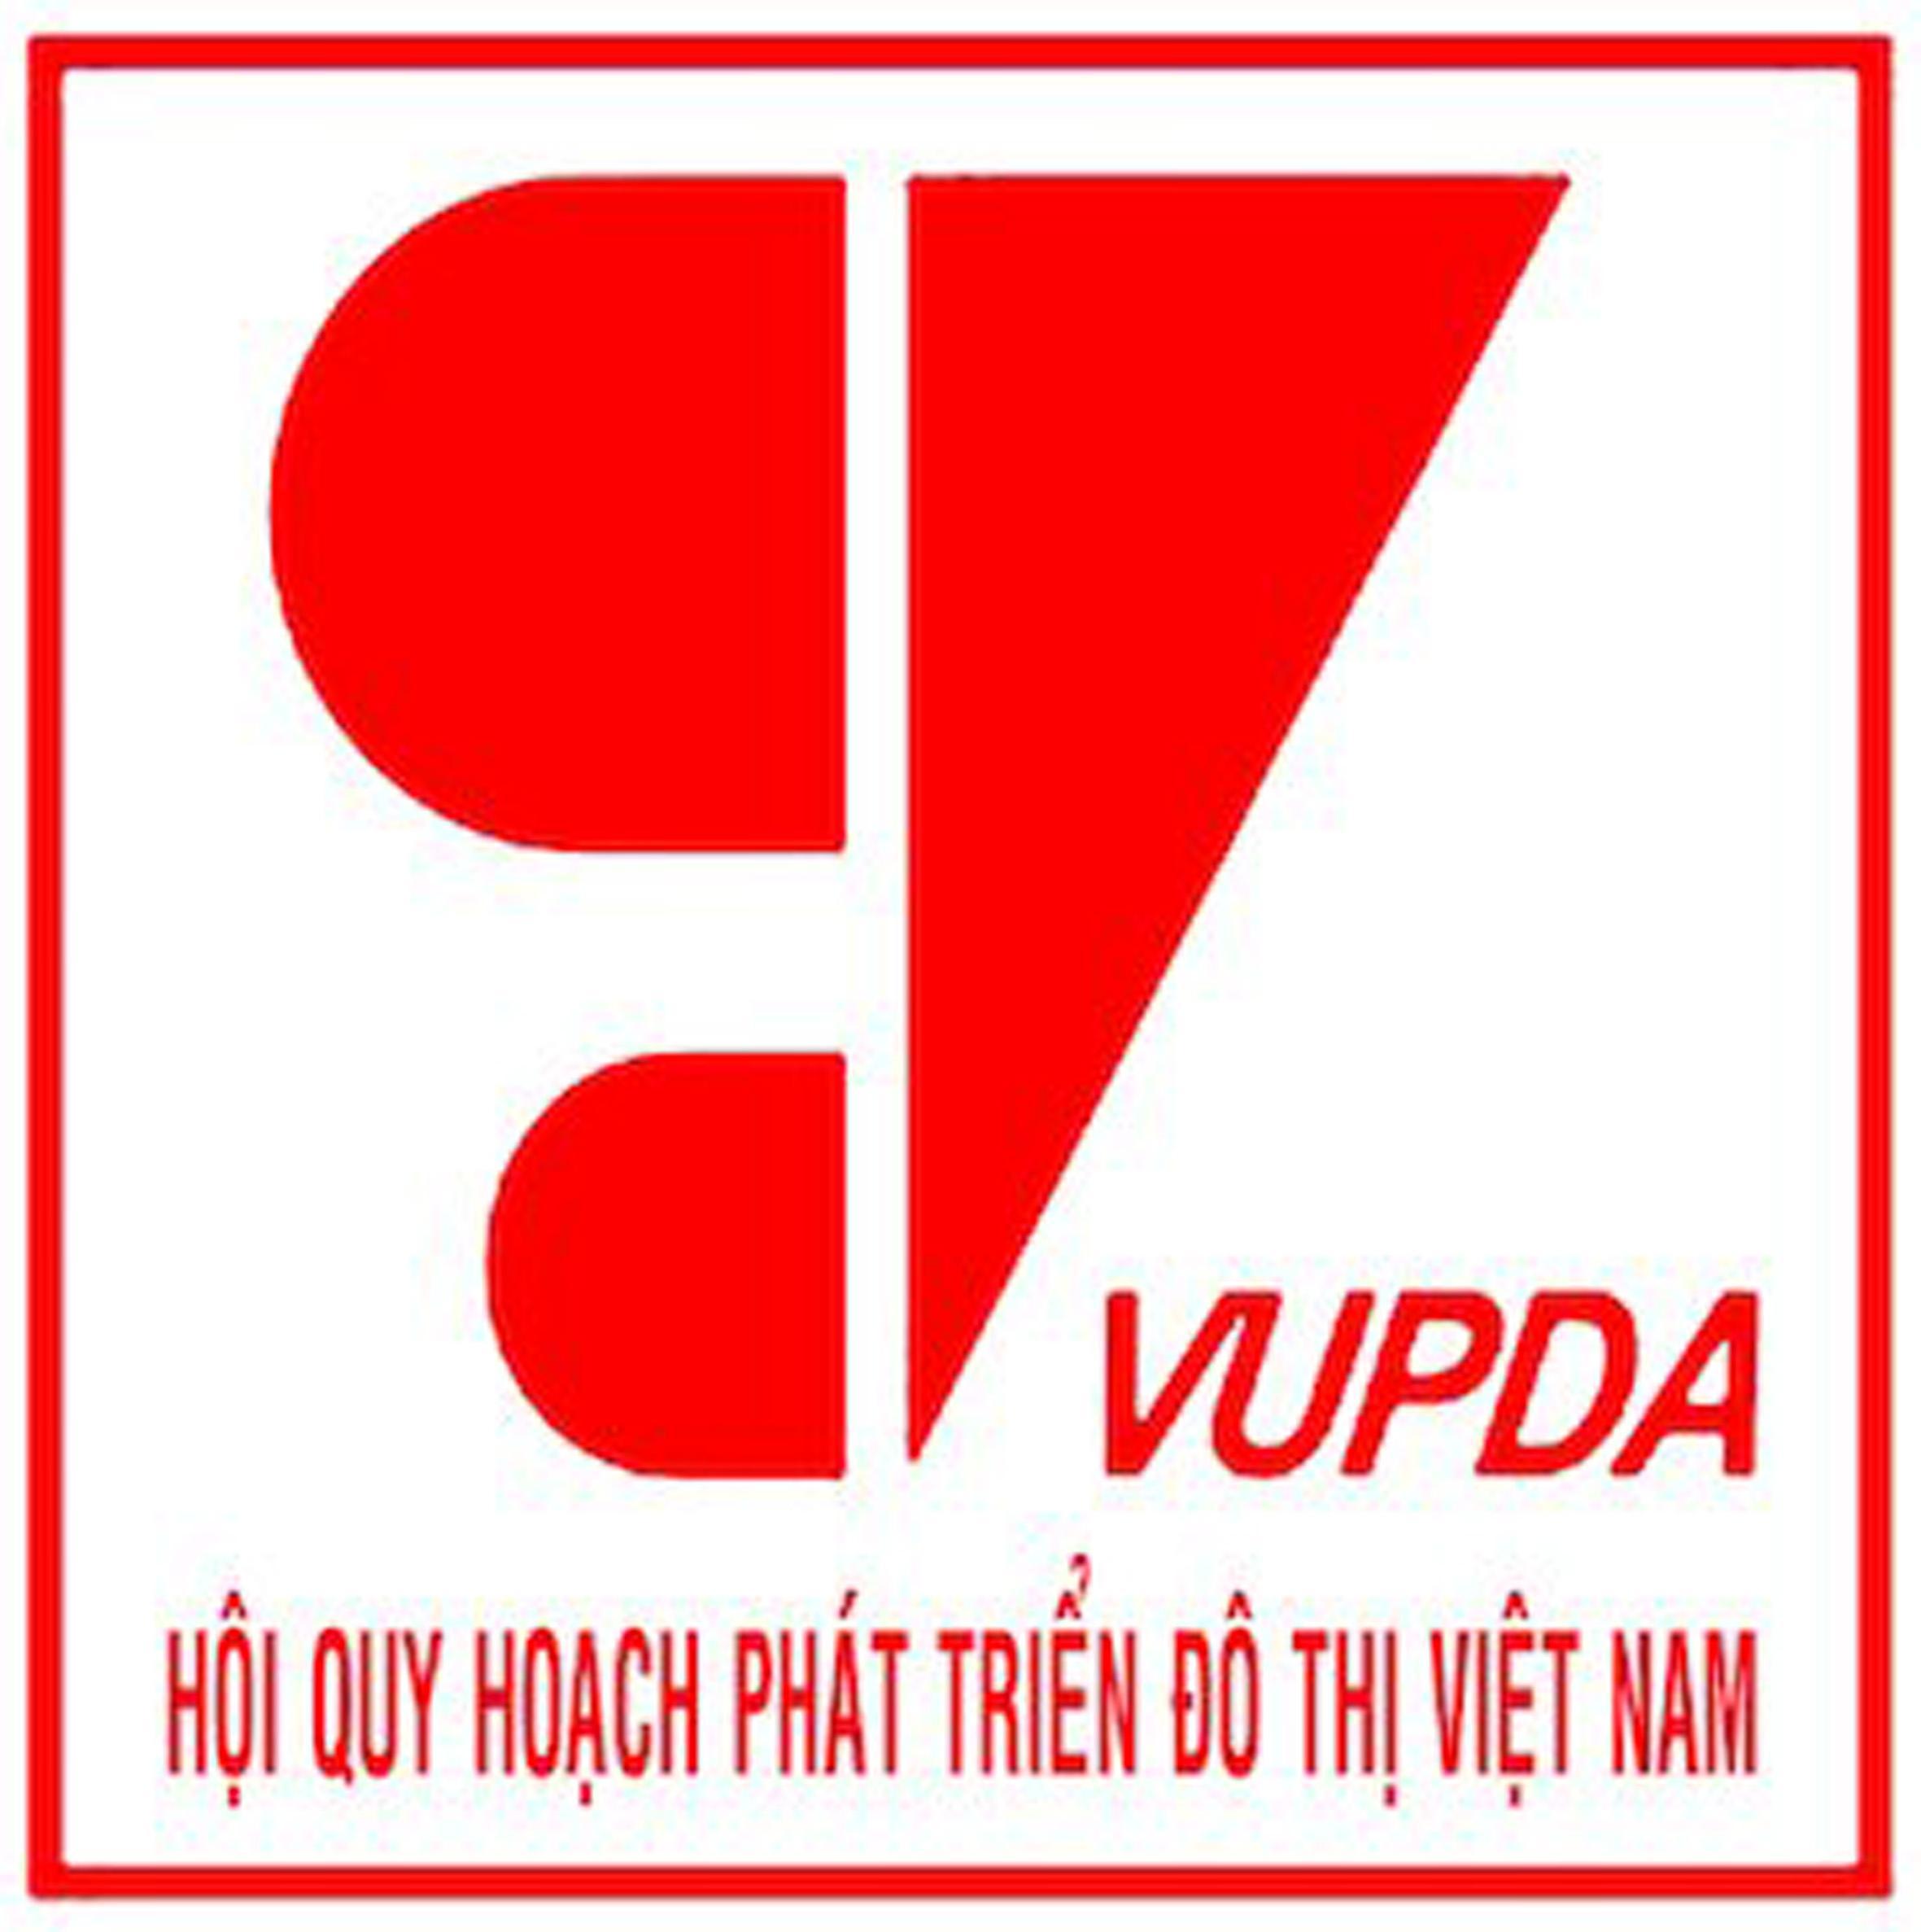 VIETNAM URBAN PLANNING AND DEVELOPMENT ASSOCIATION